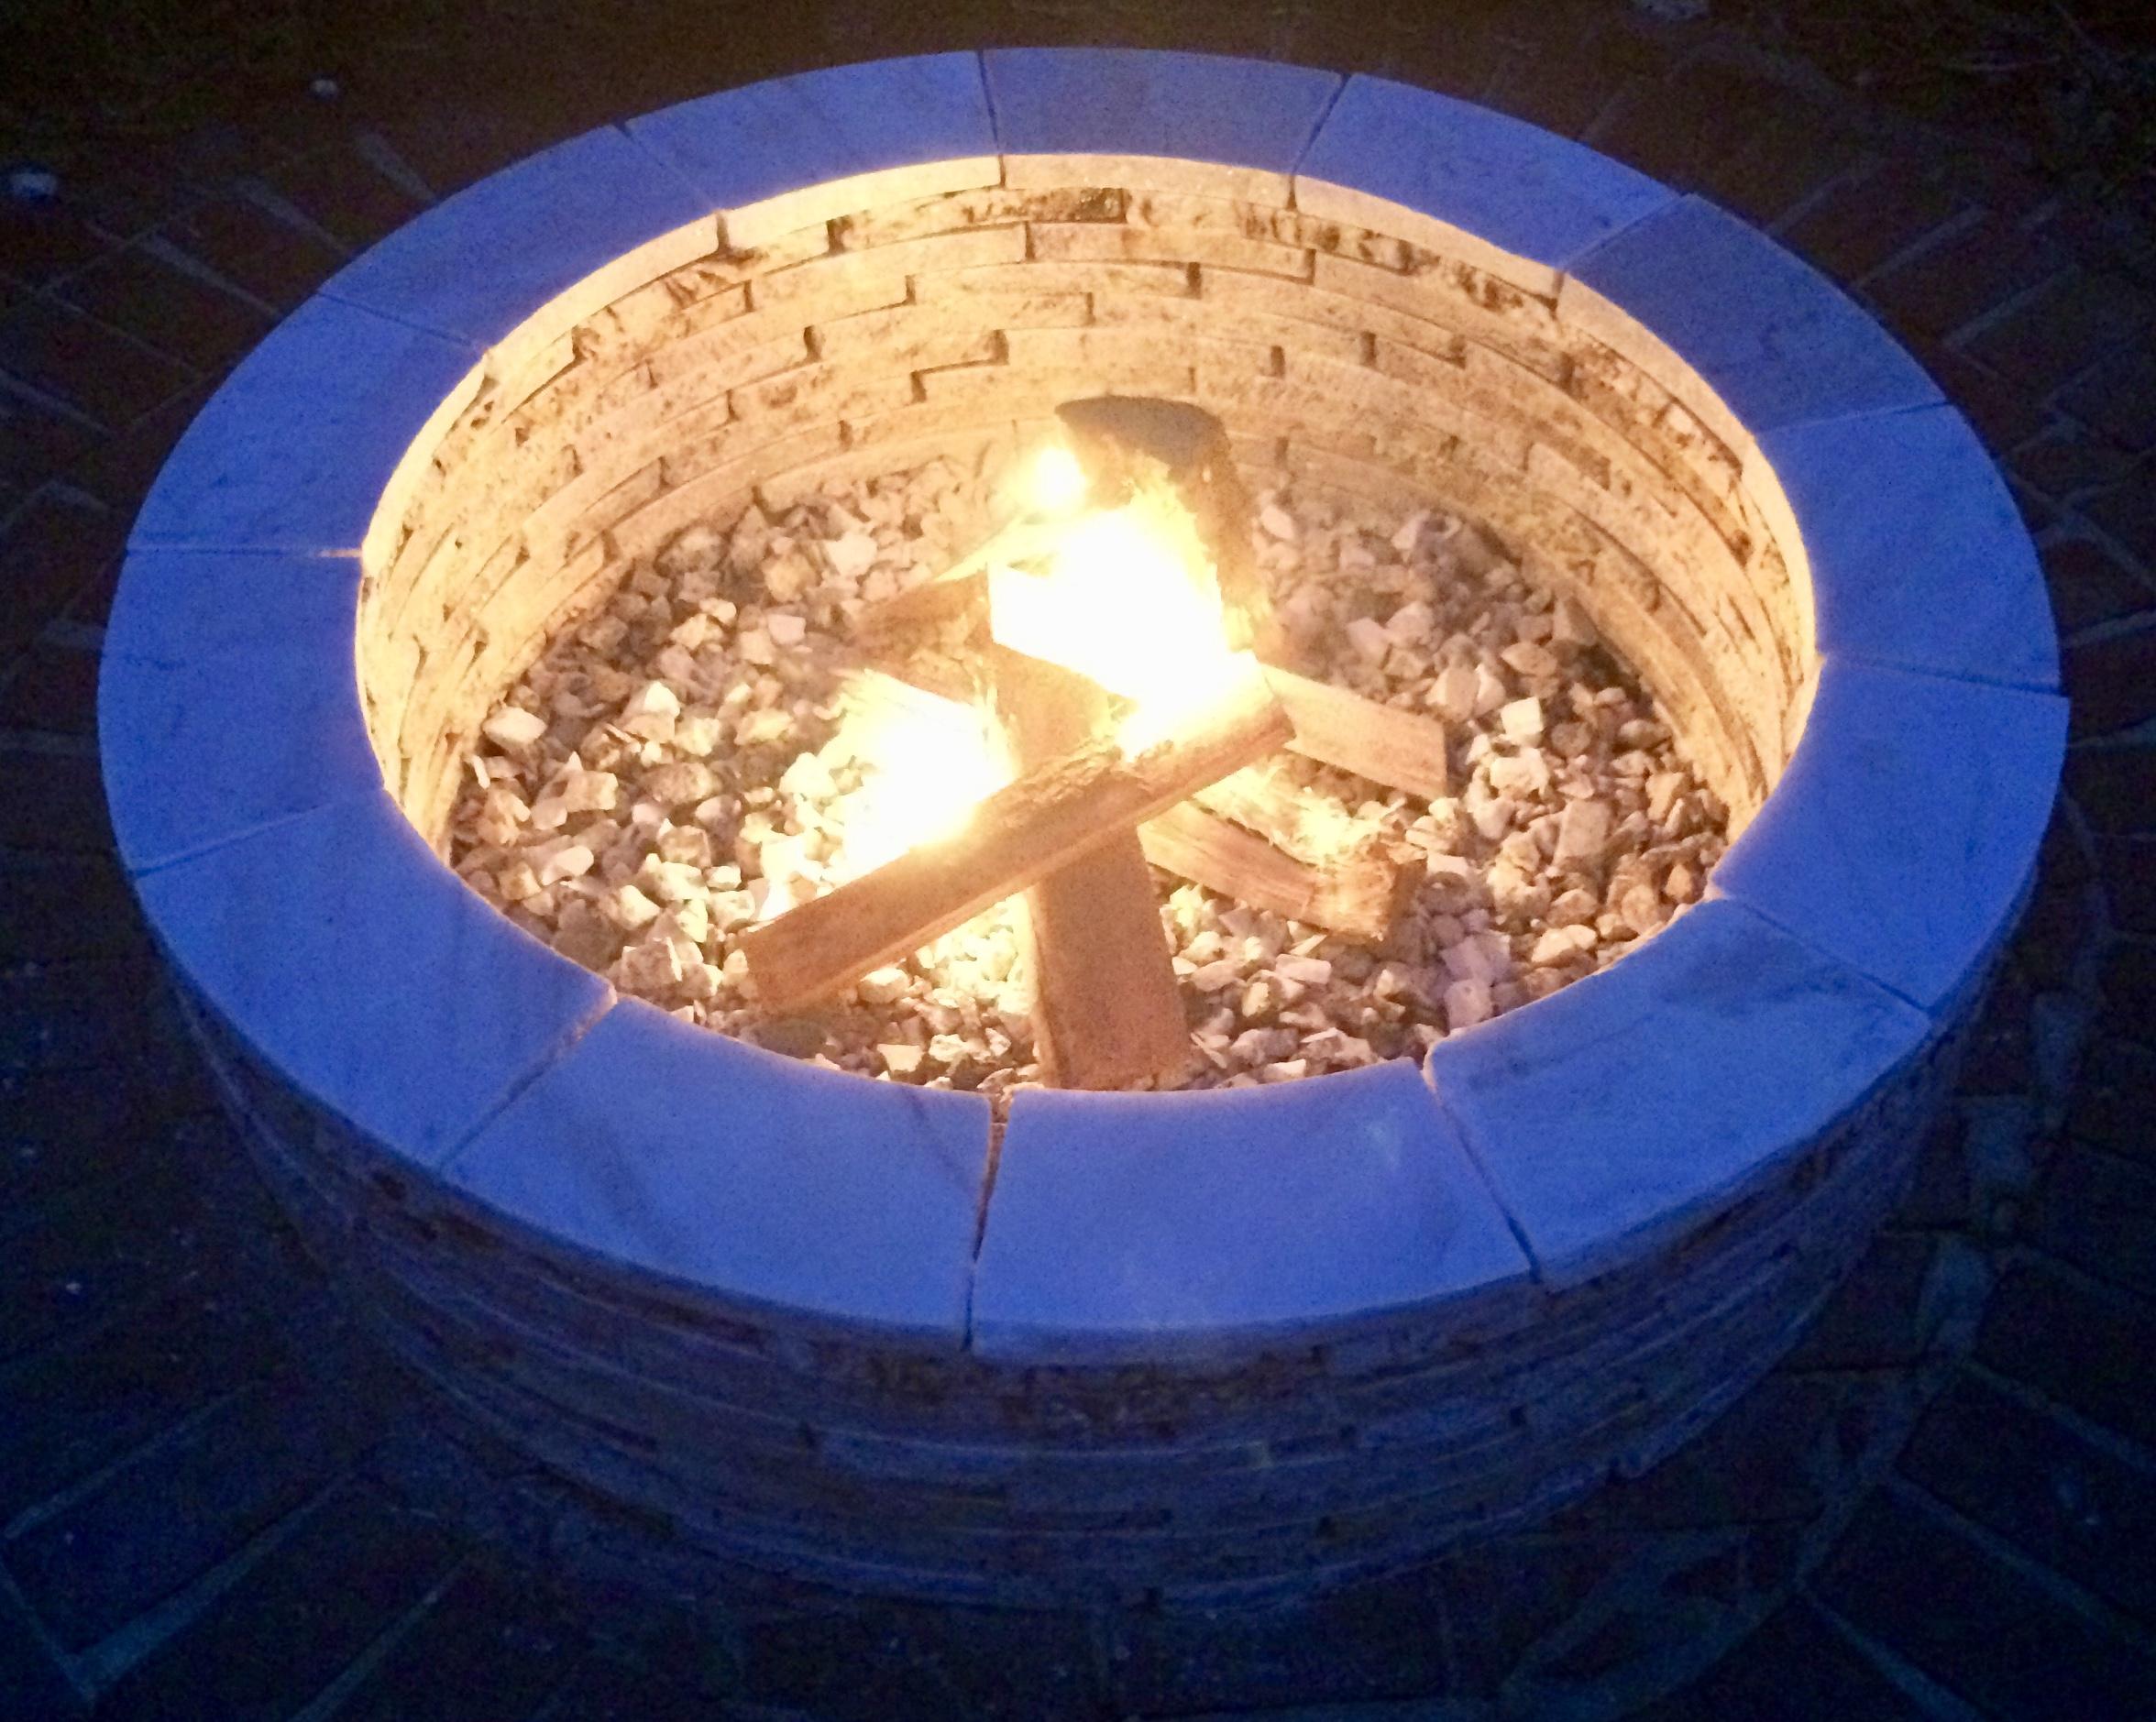 Round Fire Pit at Night.jpg